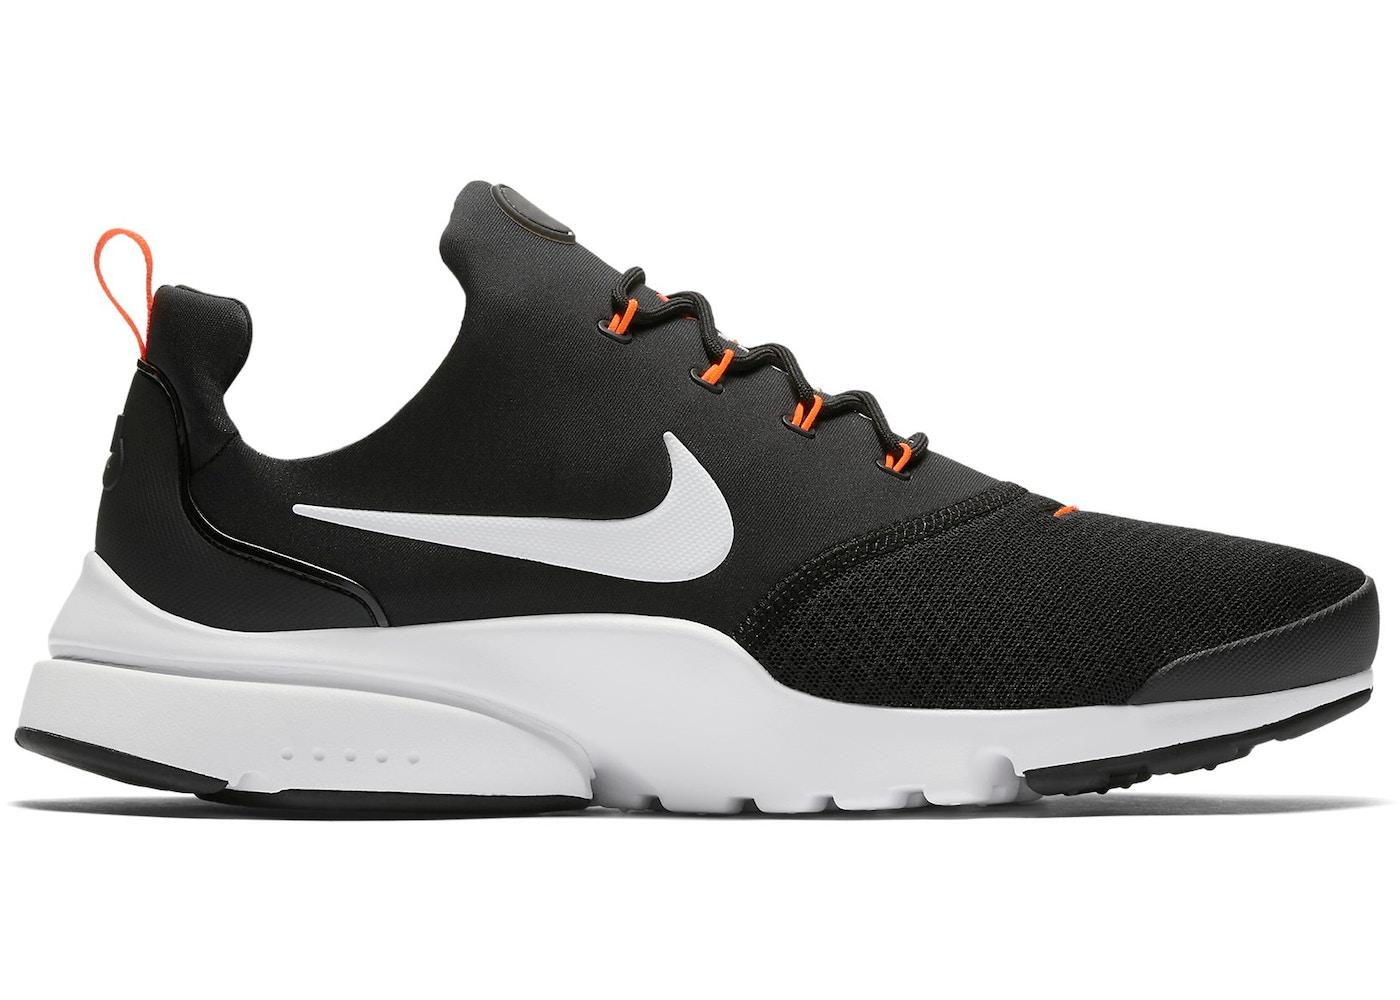 Nike Presto Fly Just Do It Pack Black - AQ9688-001